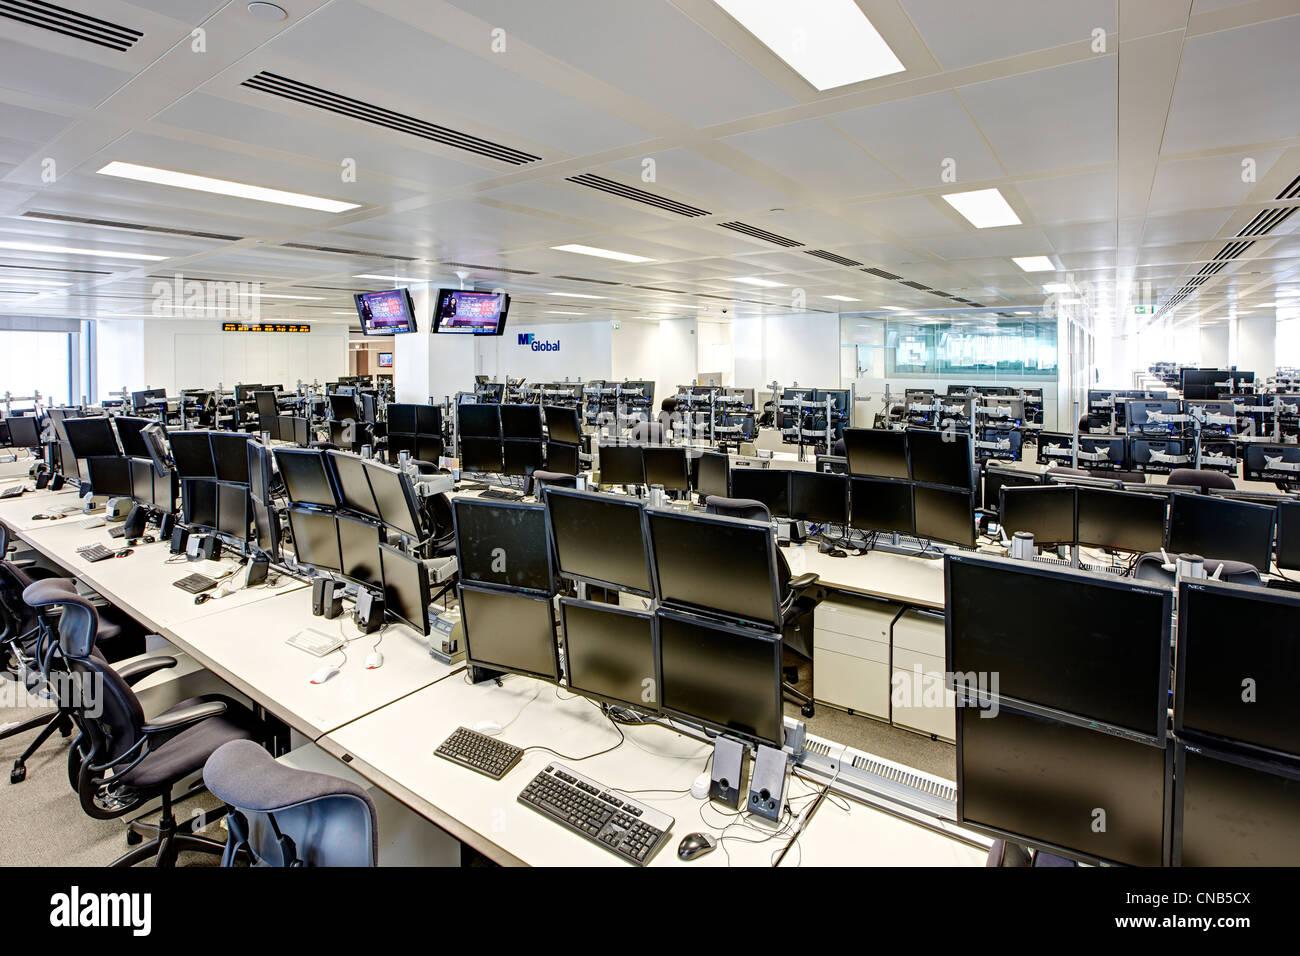 City Bank Trading Floor Desks Stock Photo 47574266 Alamy